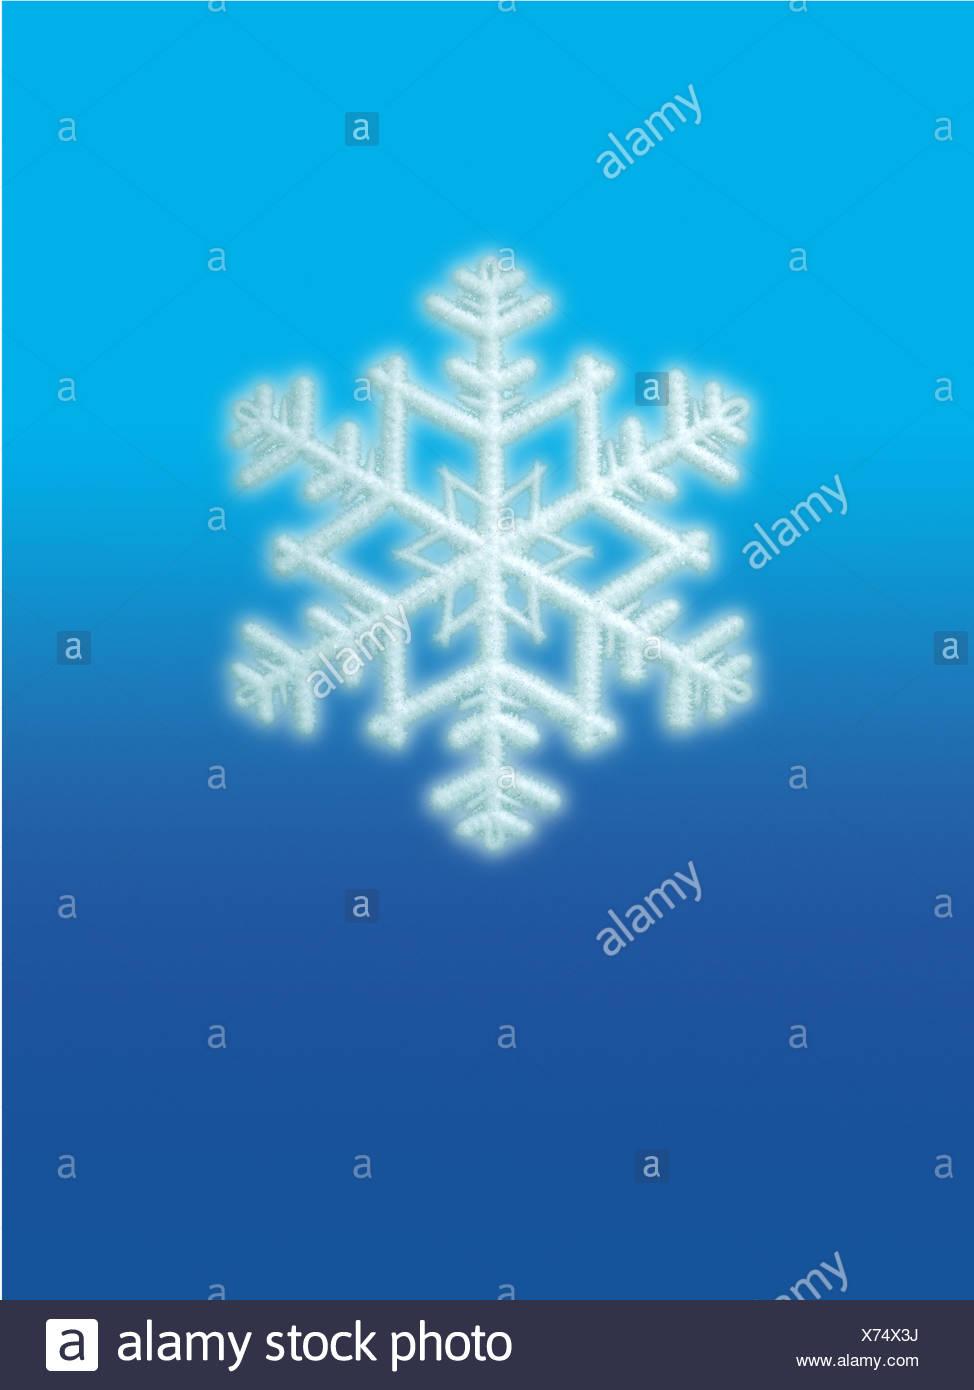 A single blue snowflake - Stock Image